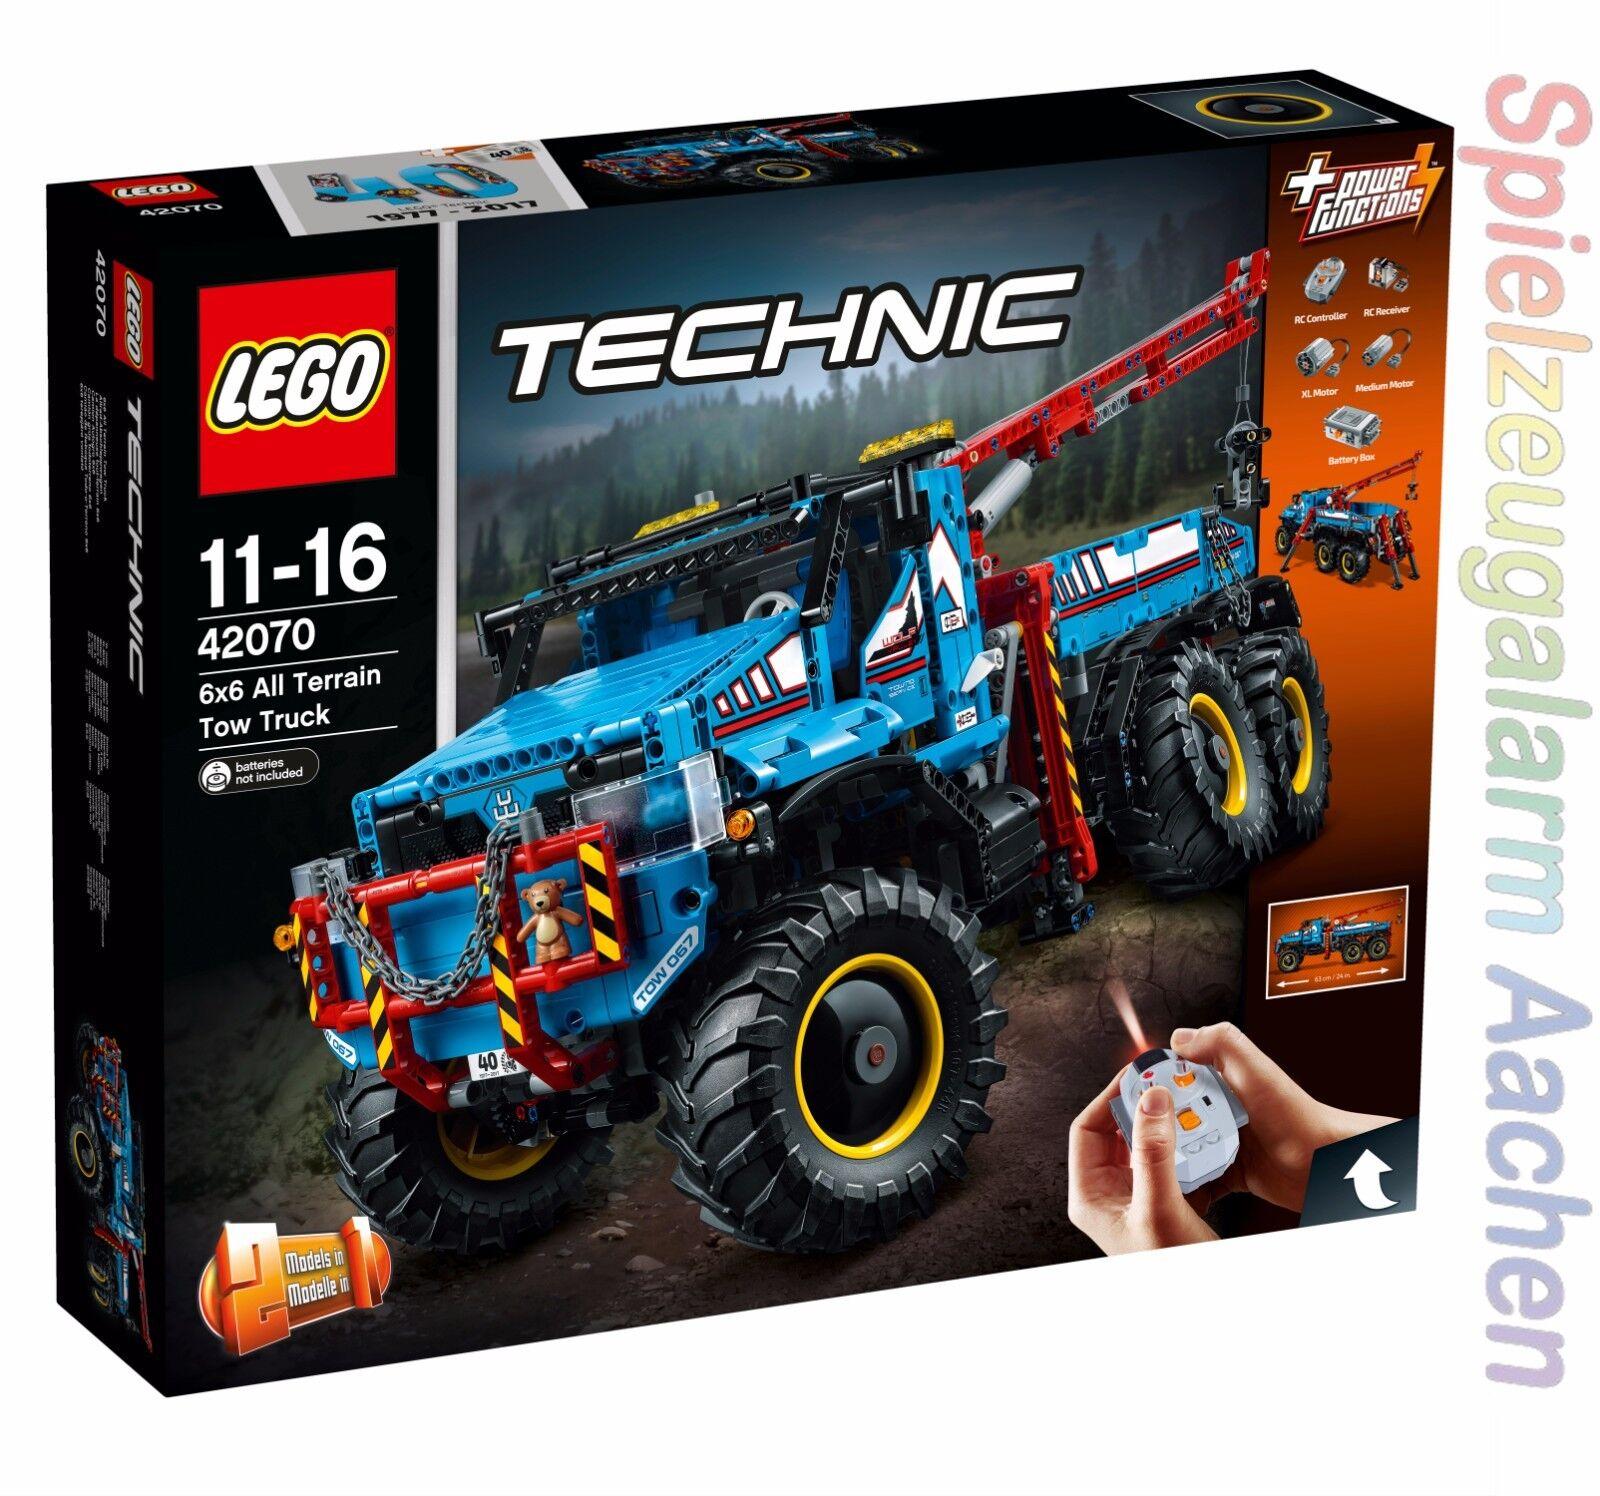 LEGO TECHNIK 42070 Allrad-Abschleppwagen La dépanneuse tout-terrain 6x6 N8 17